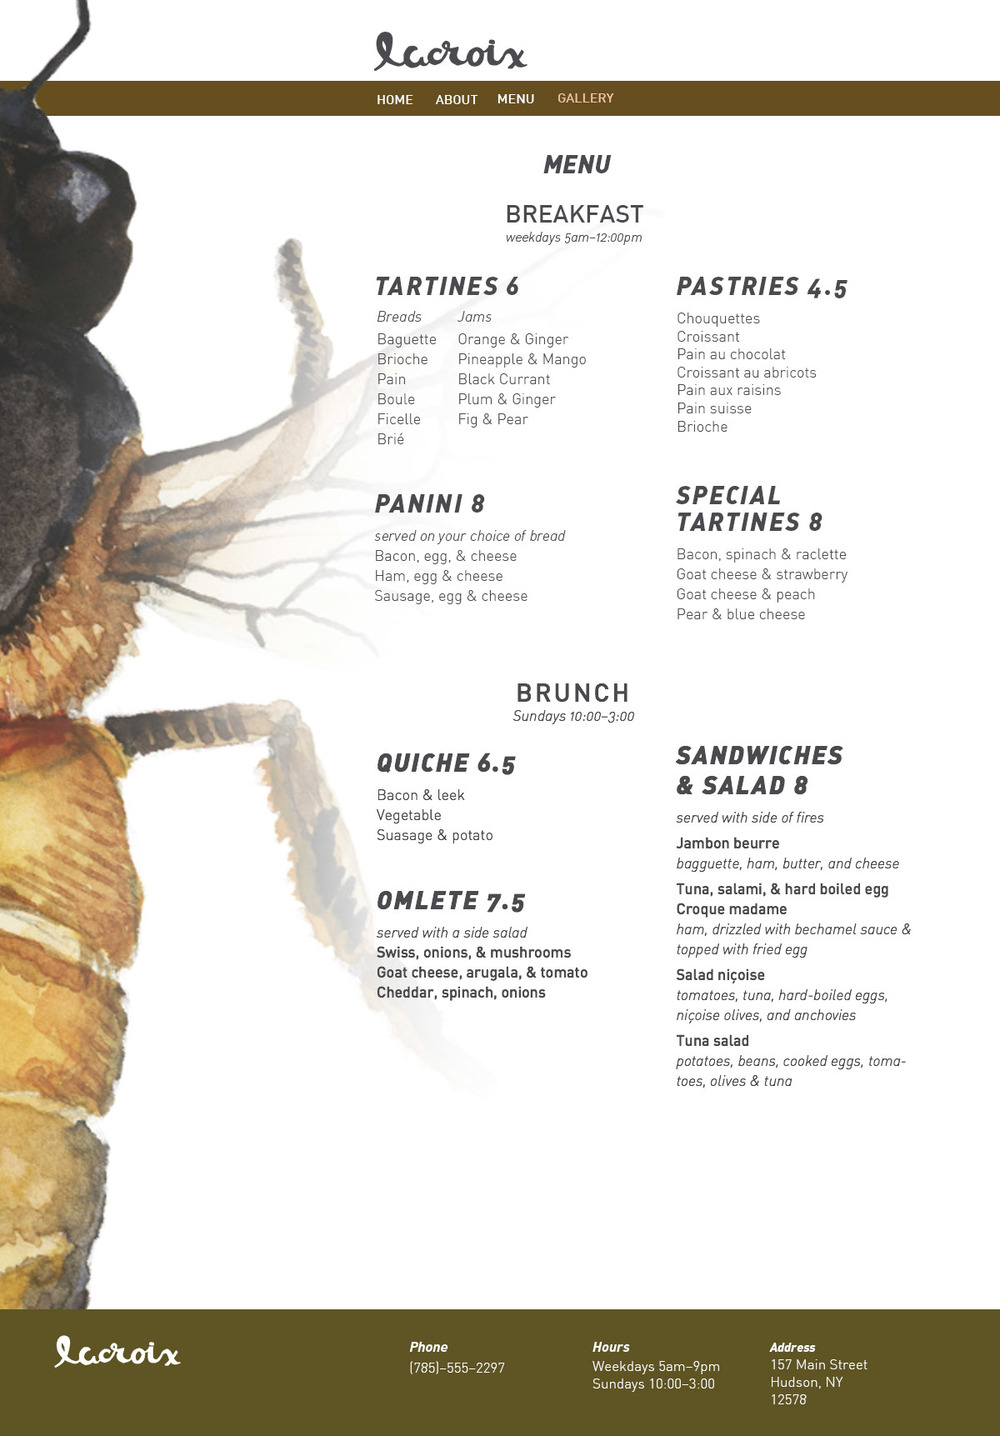 menu_page.jpg